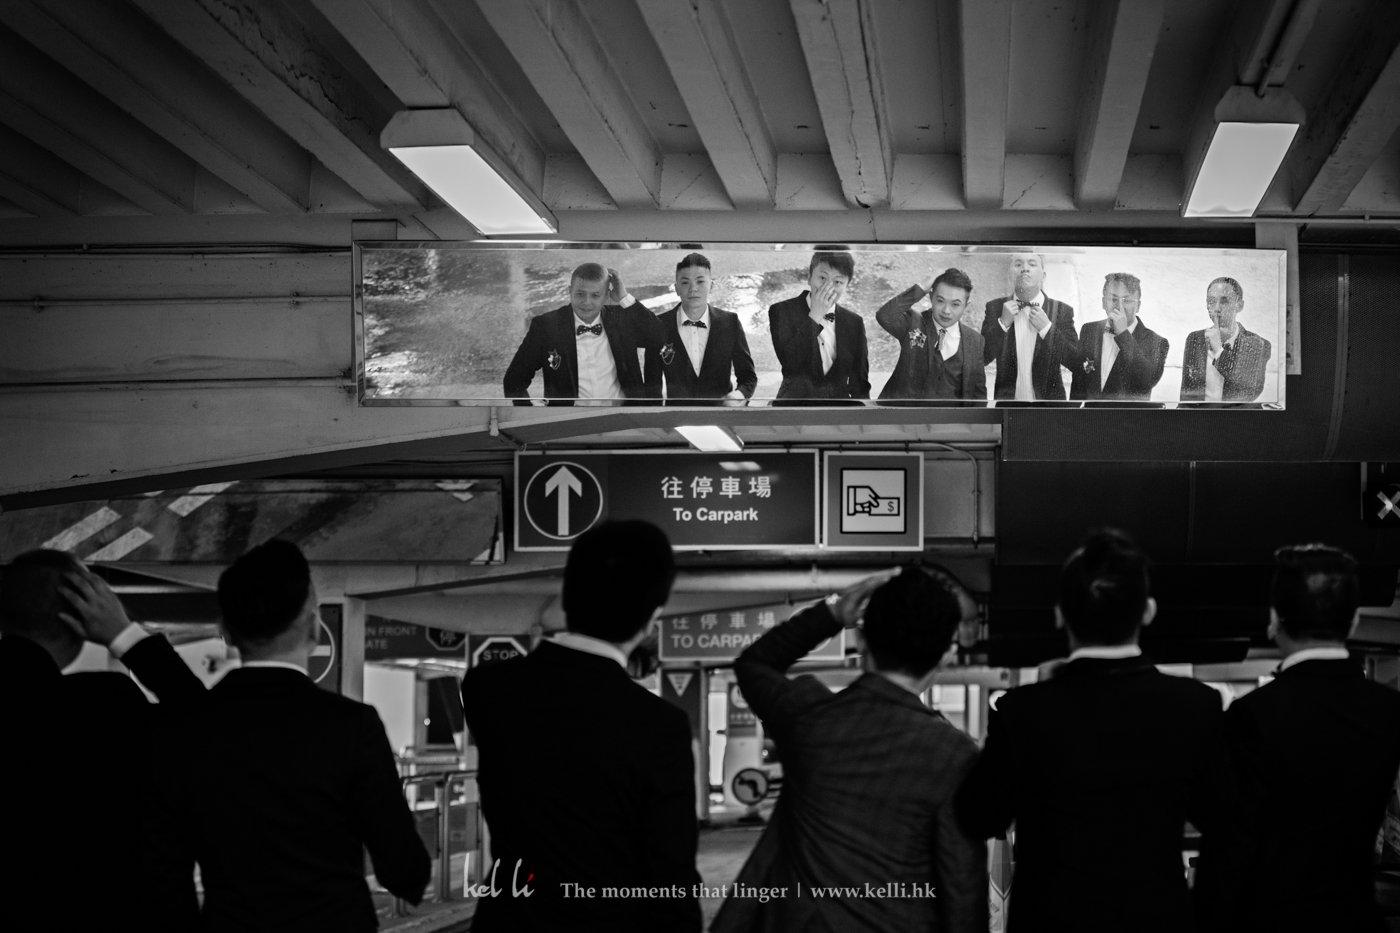 三號風球下的婚禮 | Wedding photography 婚禮攝影